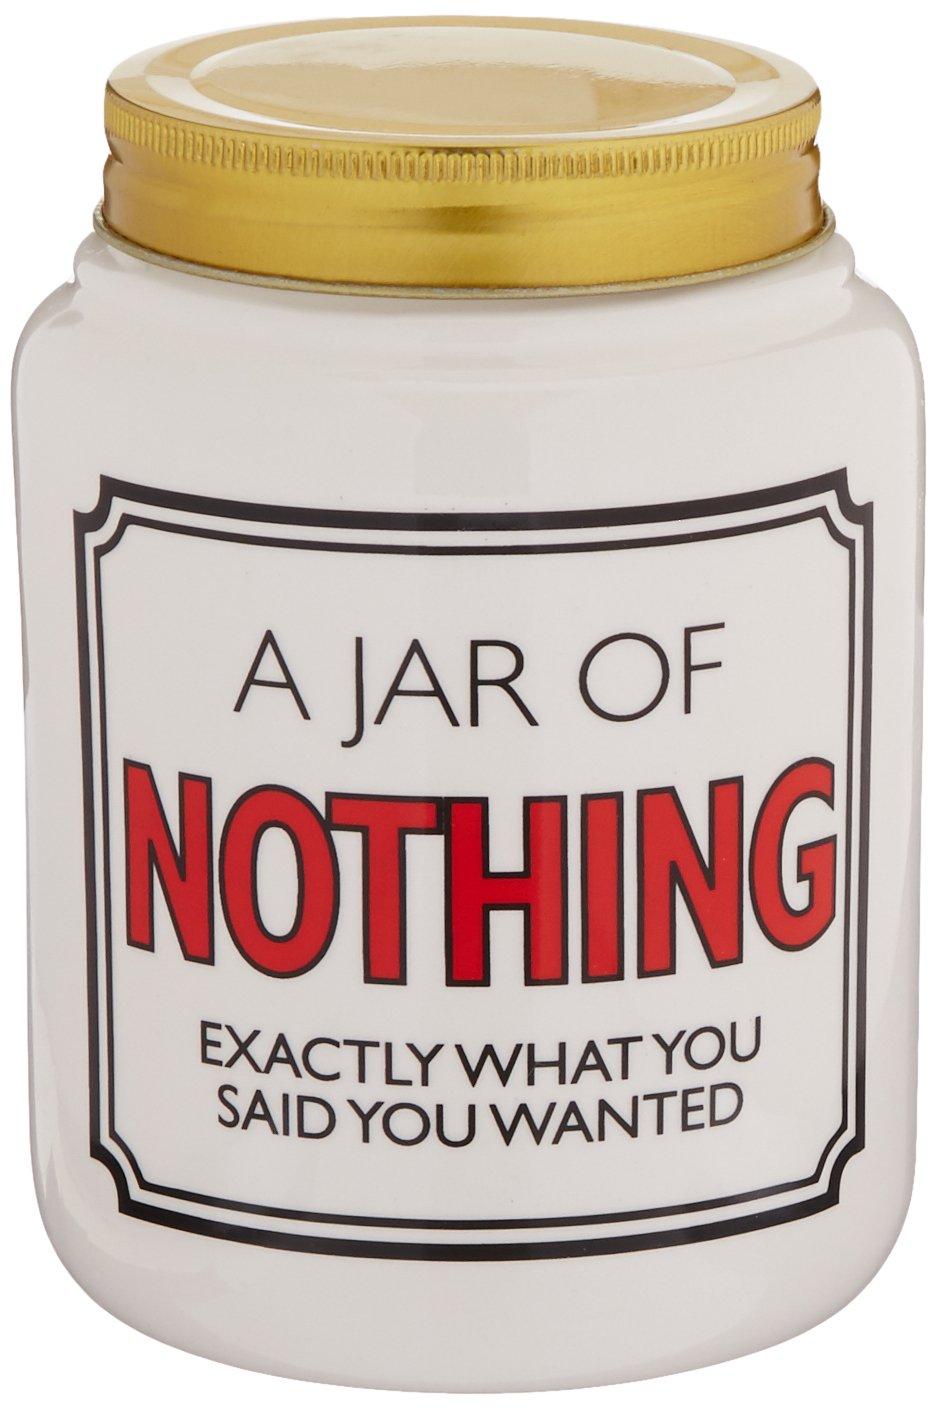 Nothing 0793842185676/